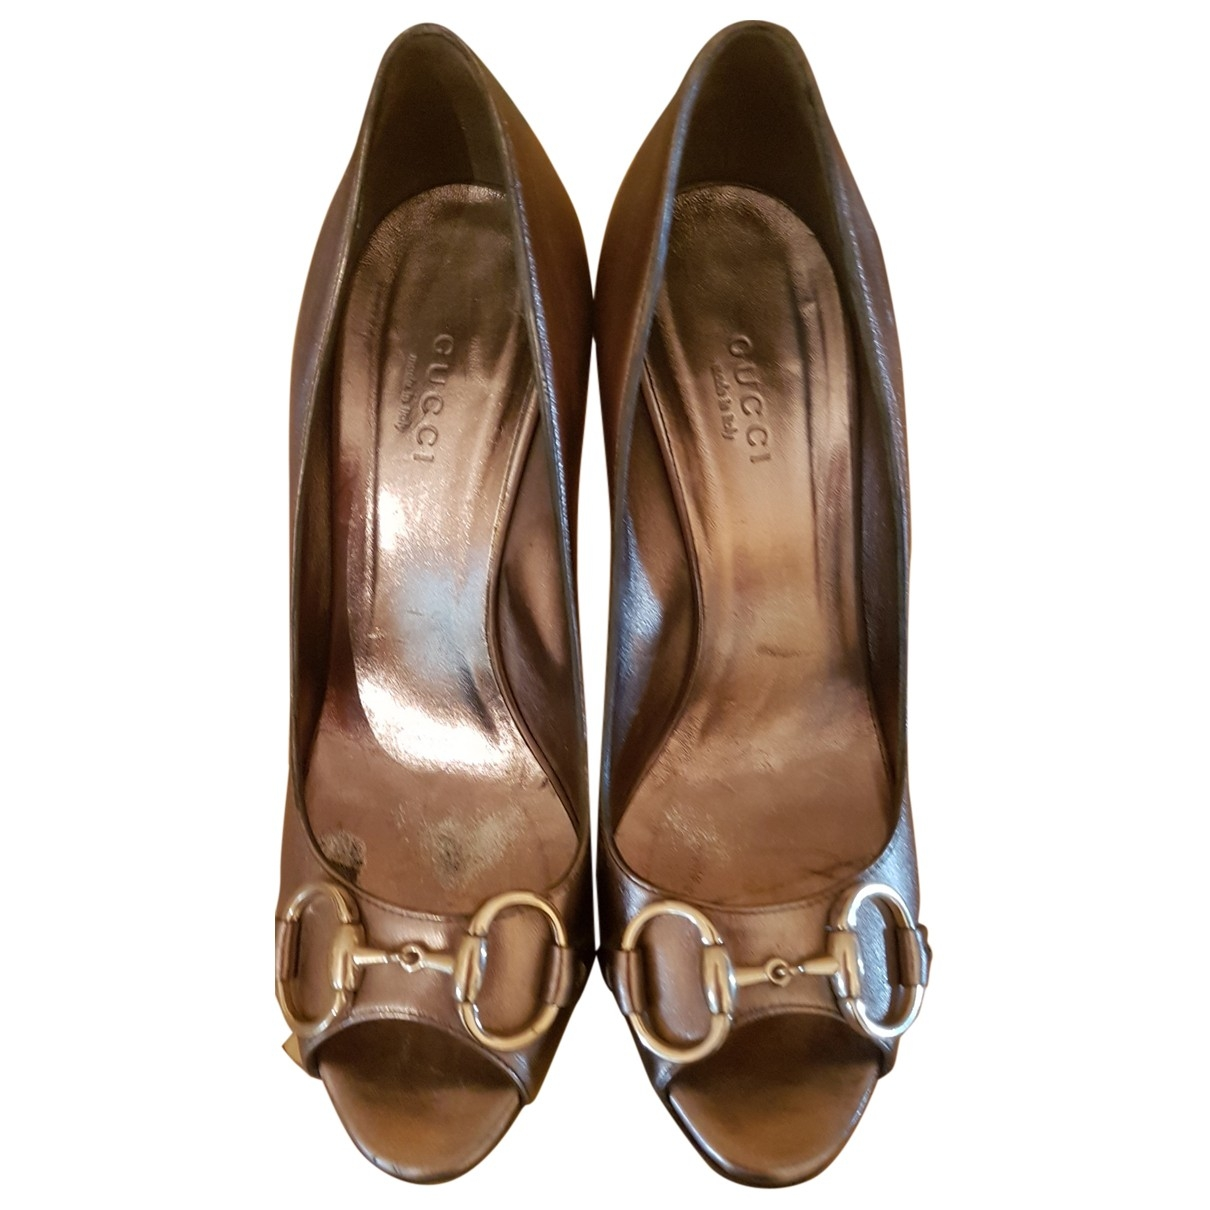 Gucci \N Metallic Leather Heels for Women 36 EU